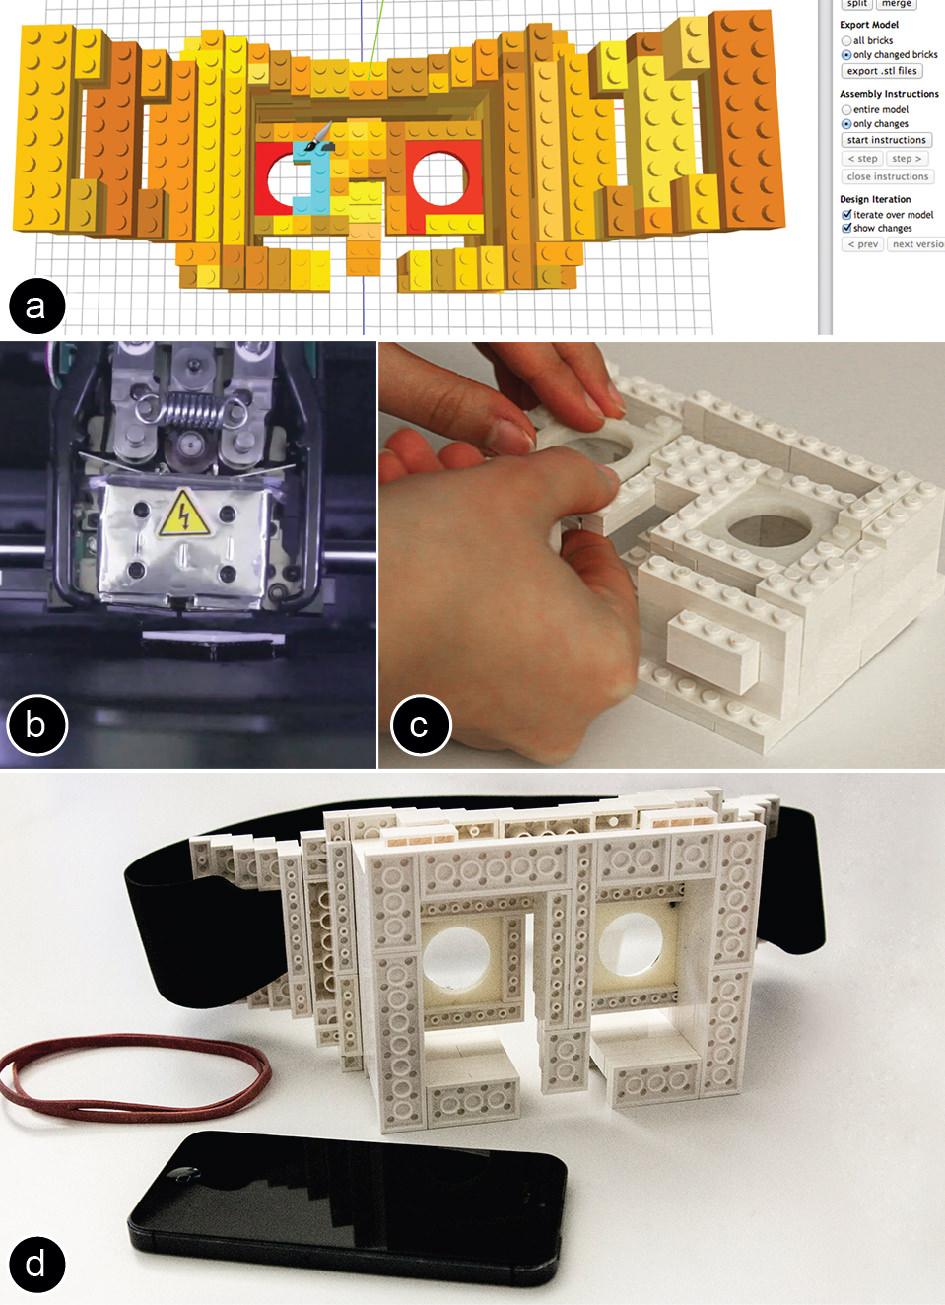 faBrickation-head-mounted-display